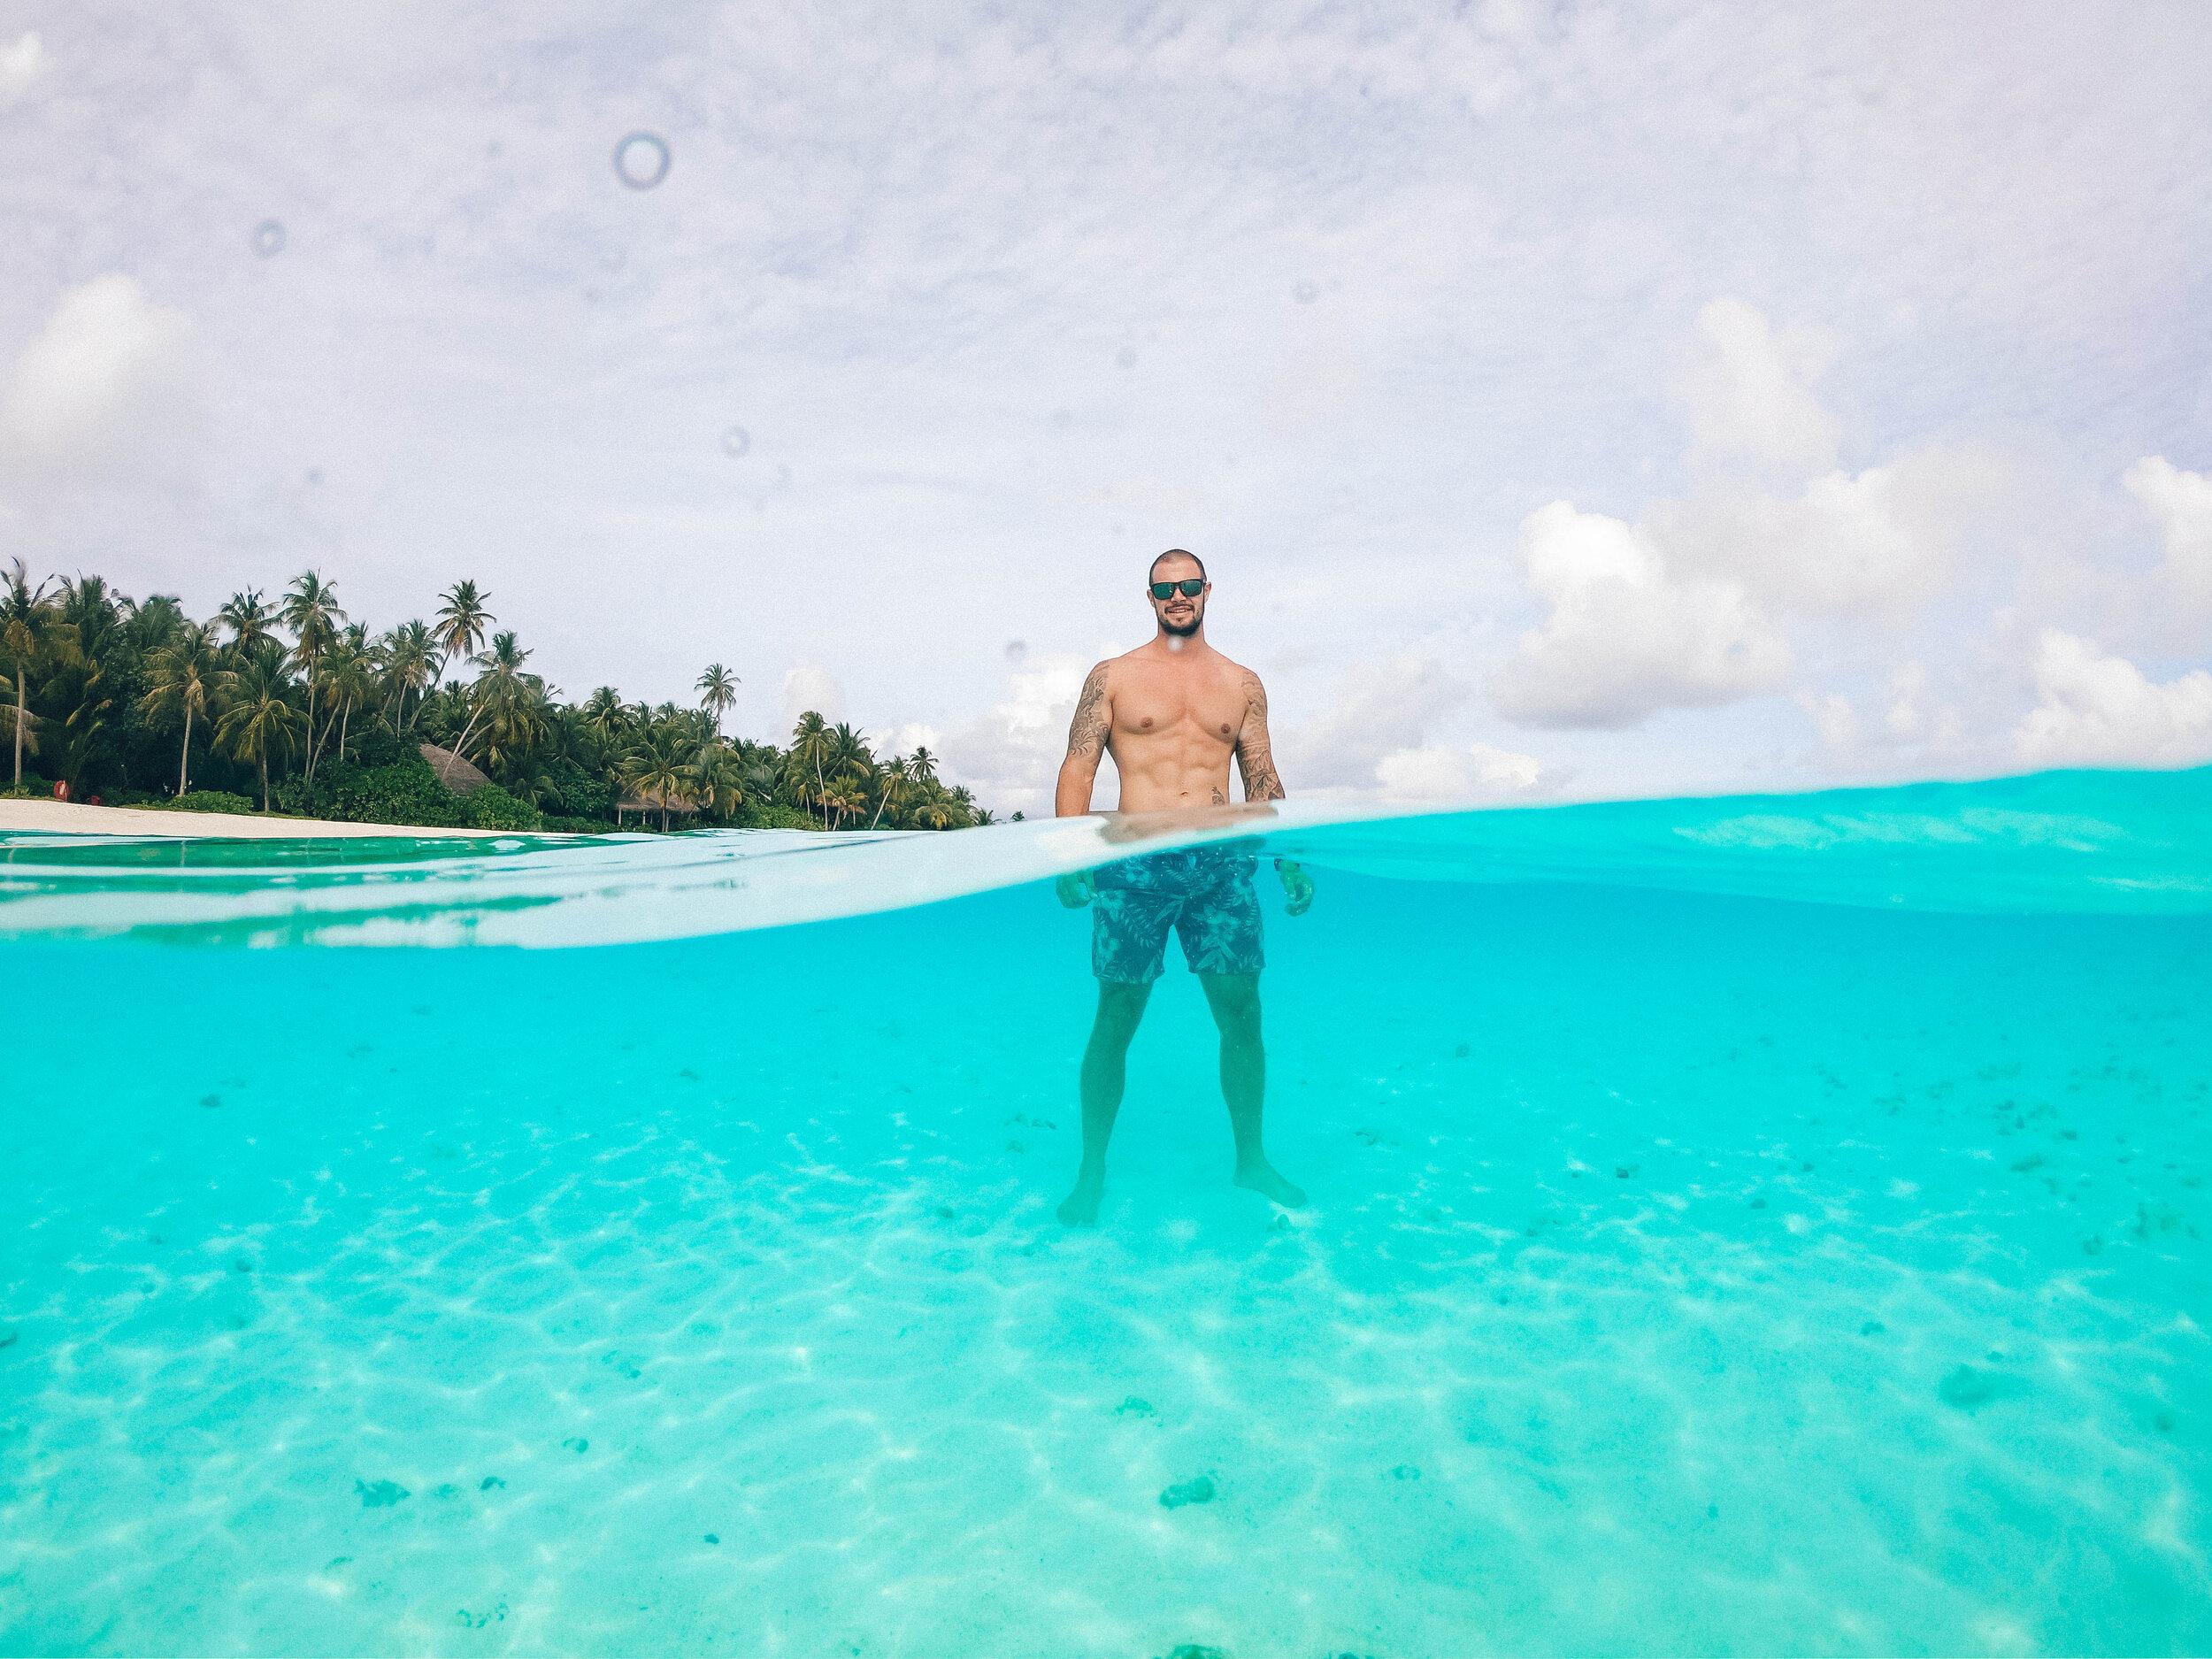 Niyama resort maldives, fitness retreats in maldives